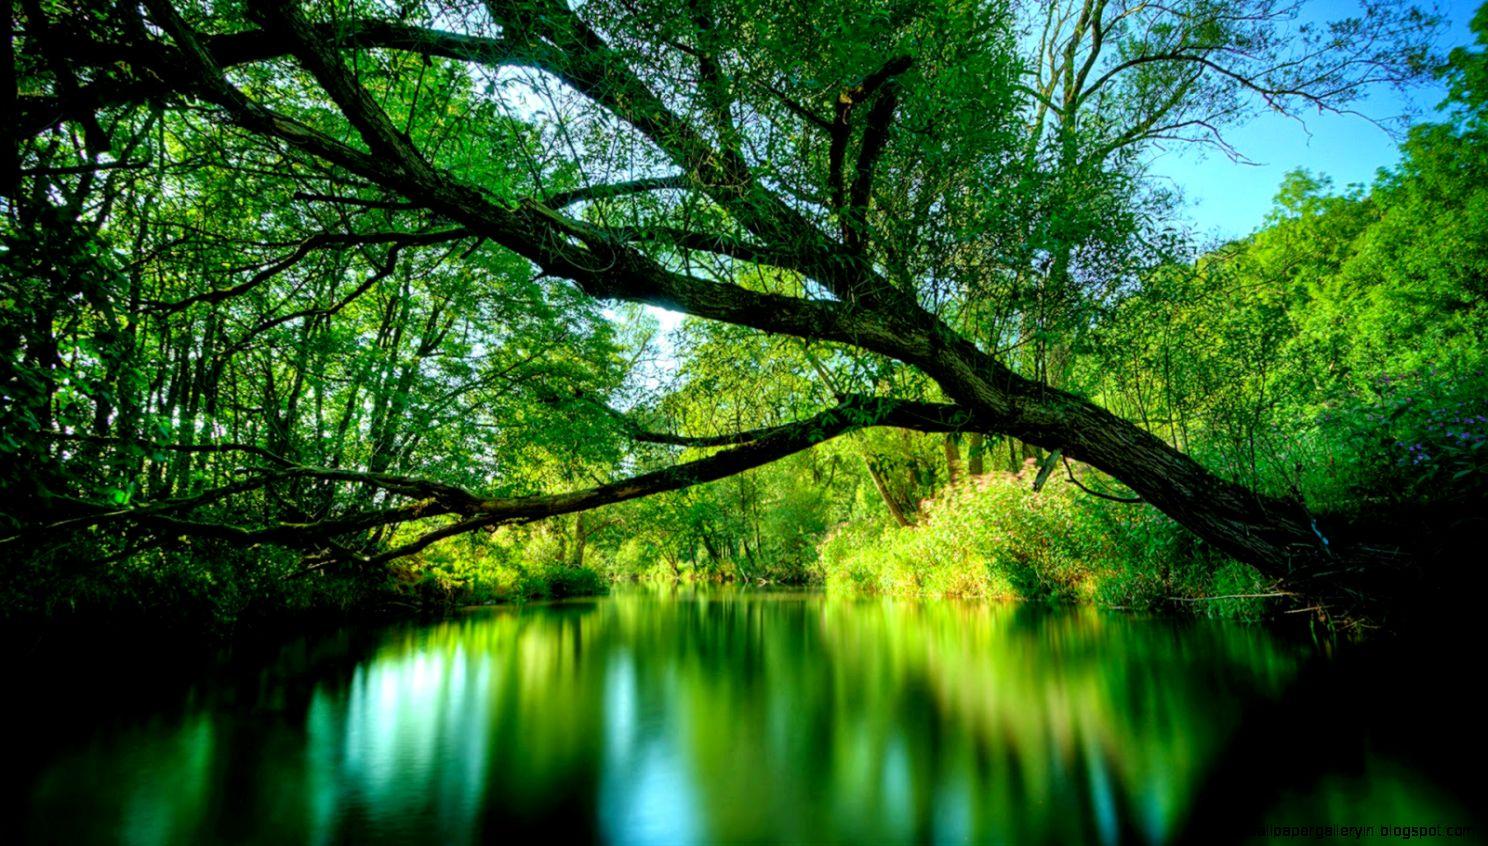 Green Natural Scenery Wallpaper